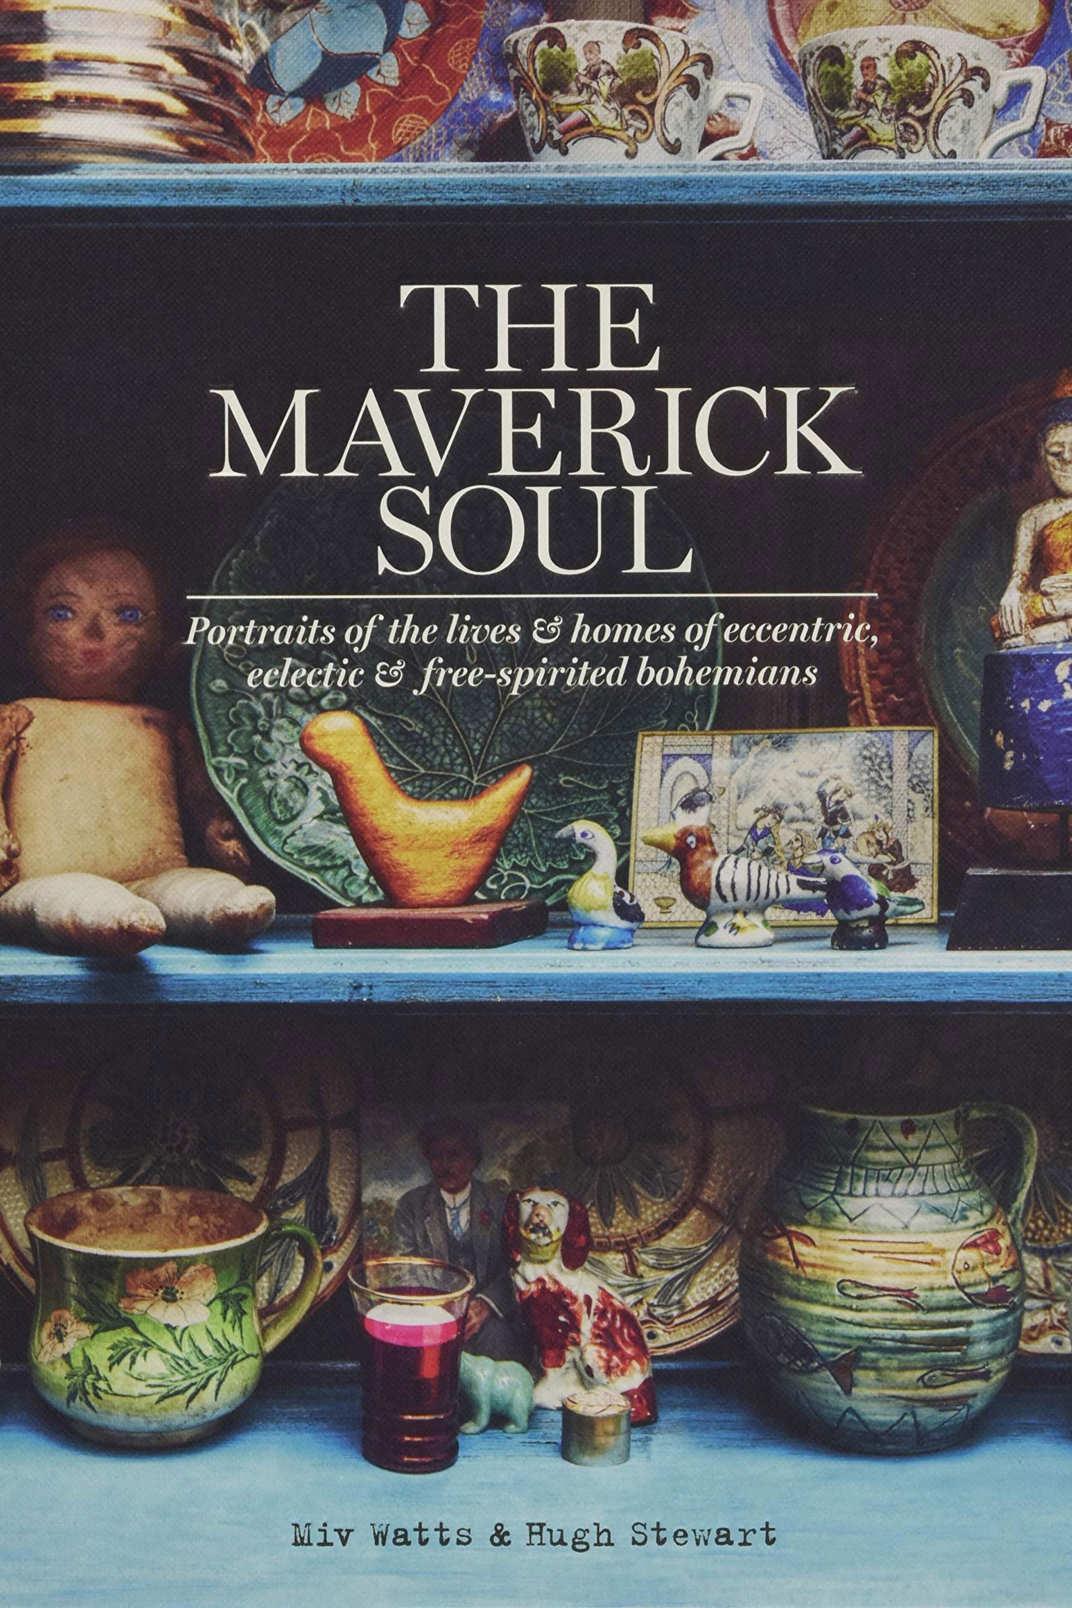 <em>The Maverick Soul</em>, by Miv Watts, Hugh Stewart, and Tracy Lines